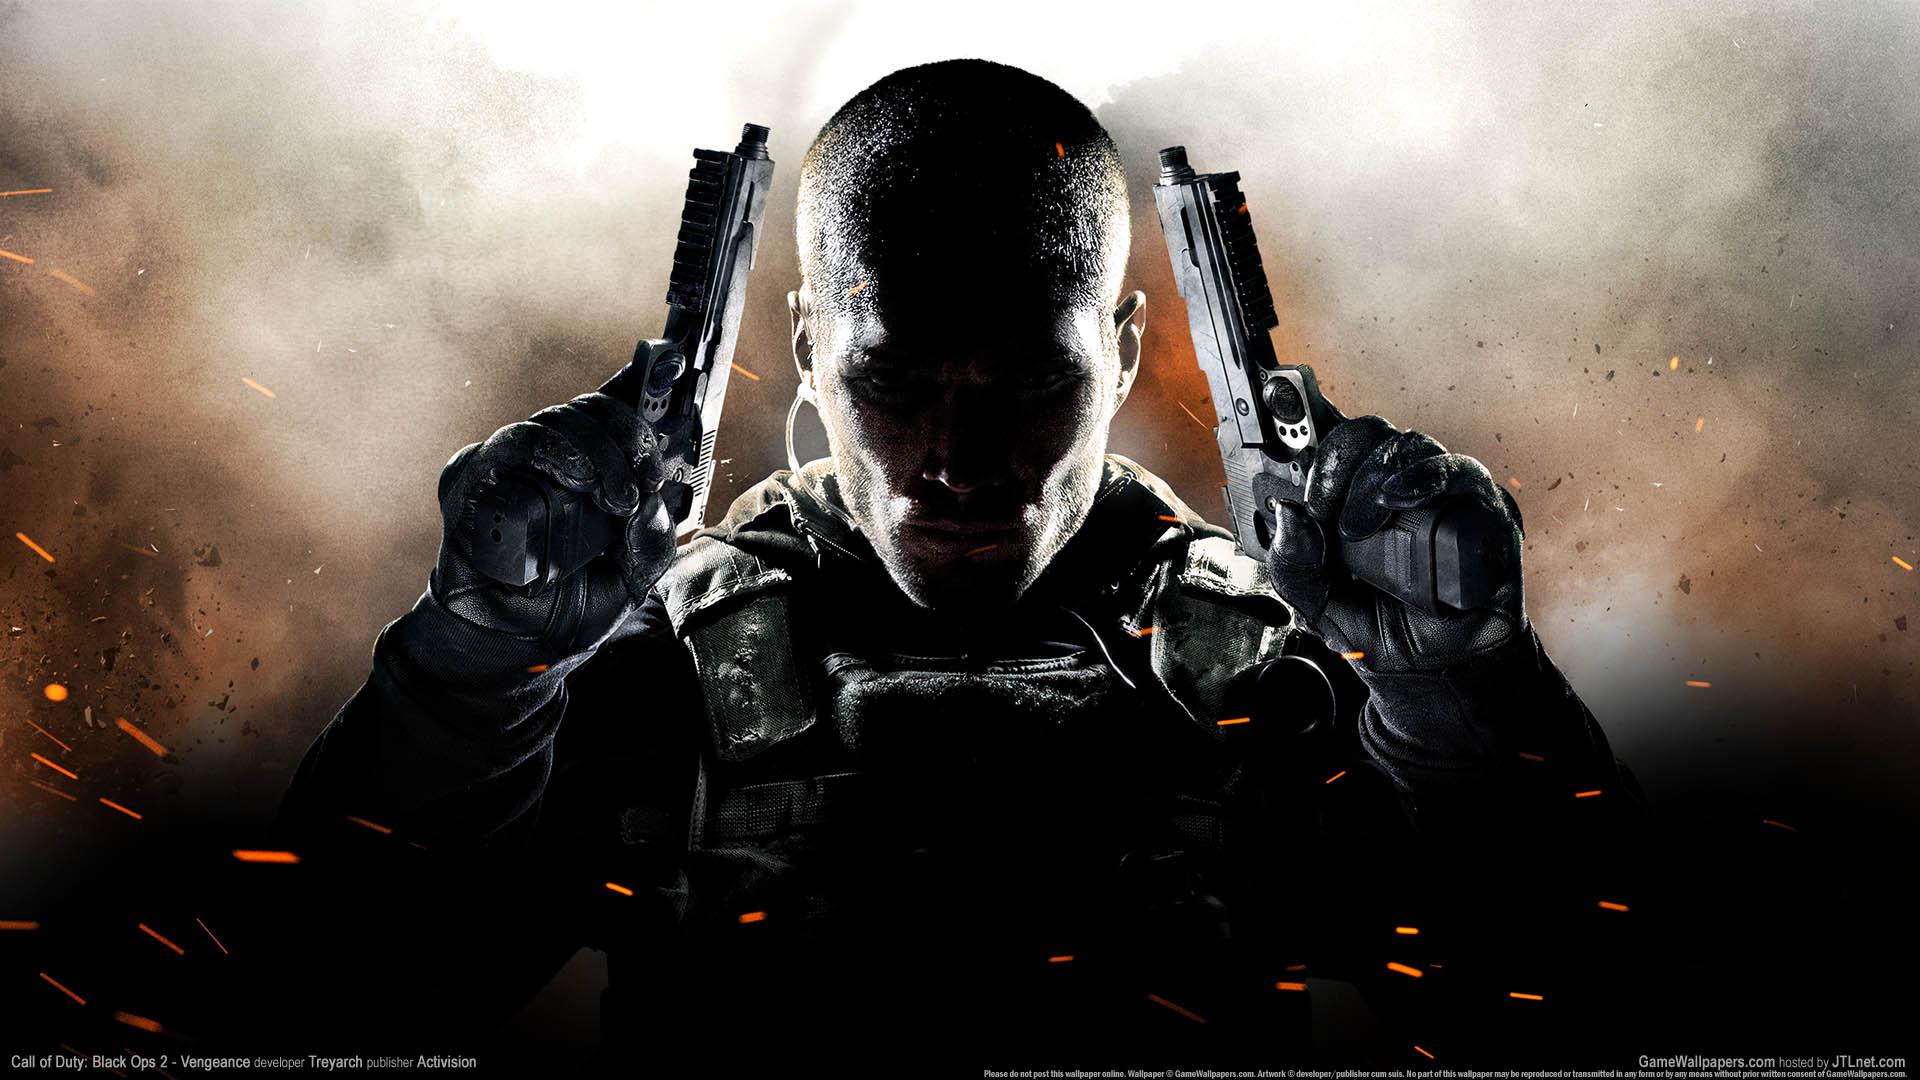 Call Of Duty Black Ops 2 Vengeance Wallpaper 01 1920x1080